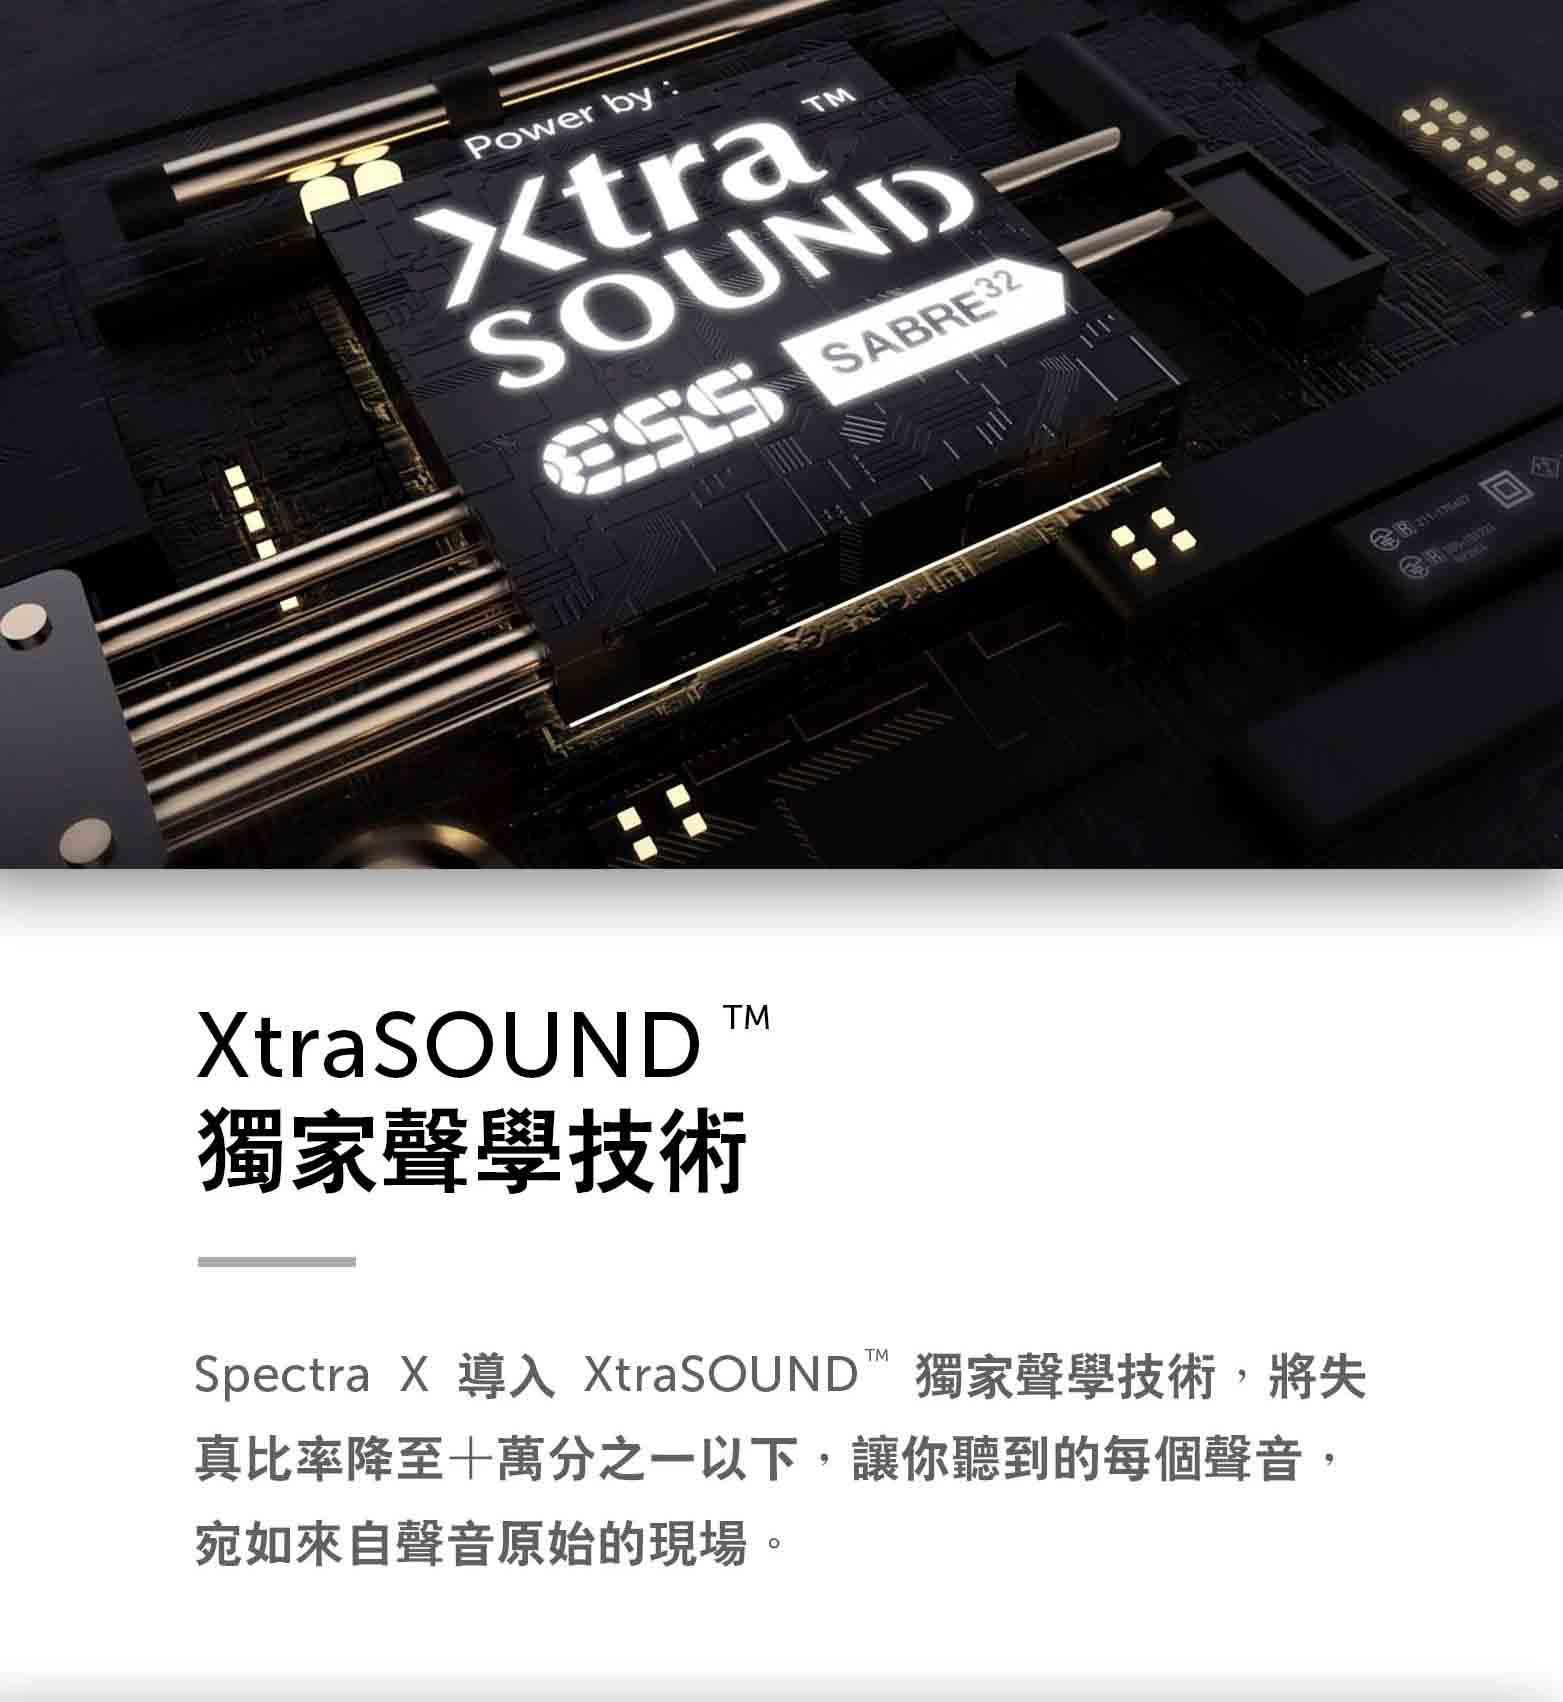 Spectra_X_美聲驅動引擎_智慧音效引擎 5